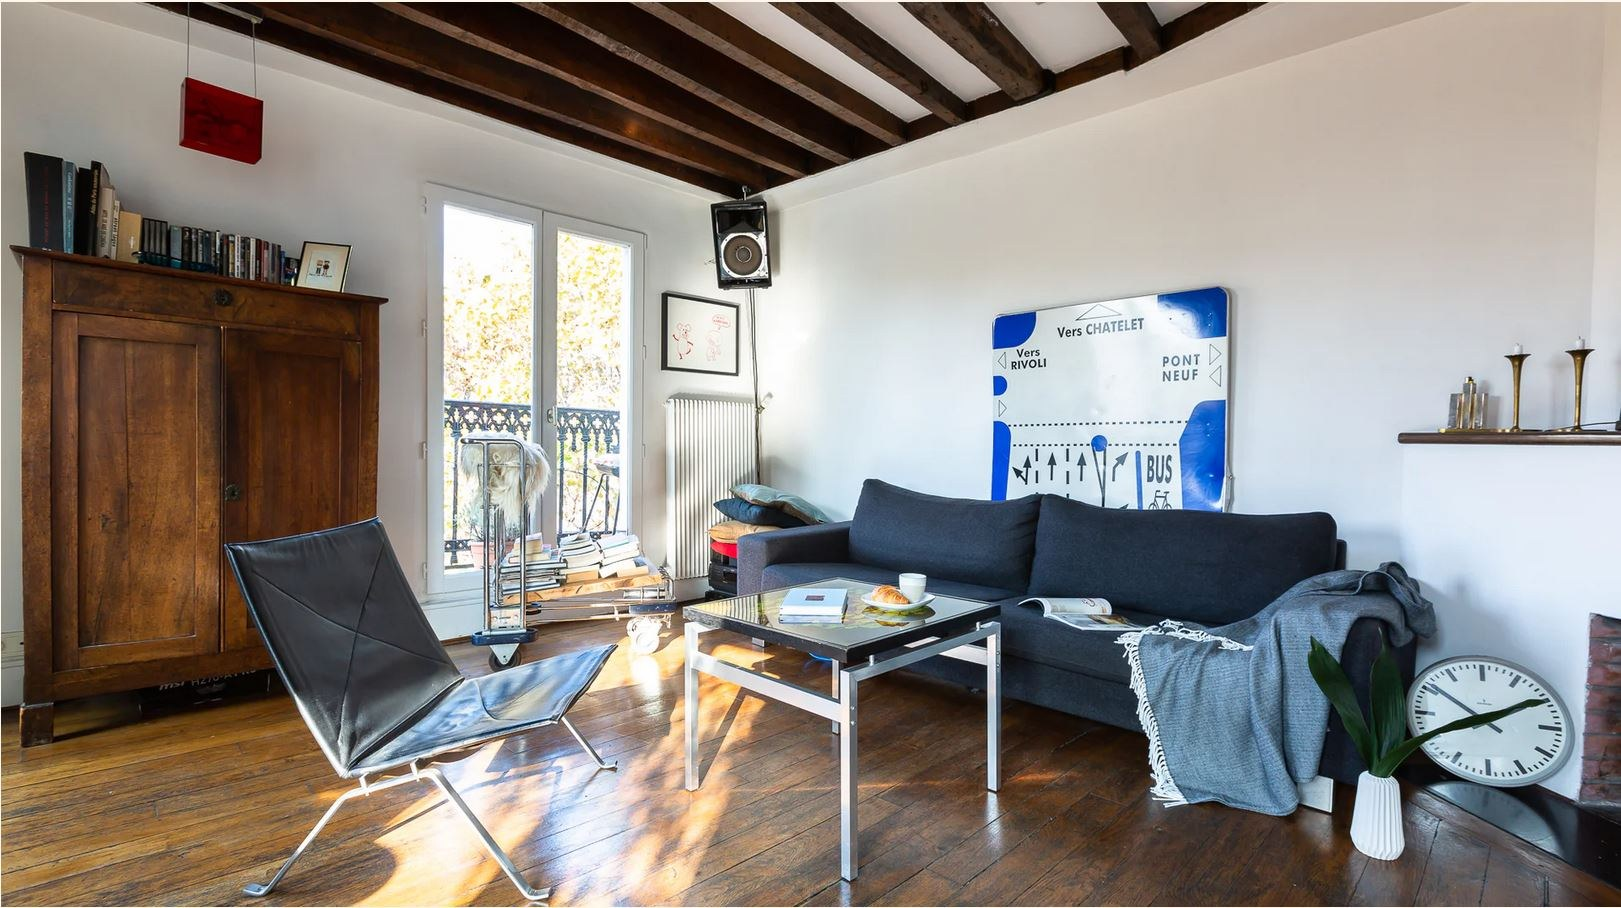 Duplex on the last floor 81.43m² (62.41m² Law Carrez) – Balcony of 11.5m² 1